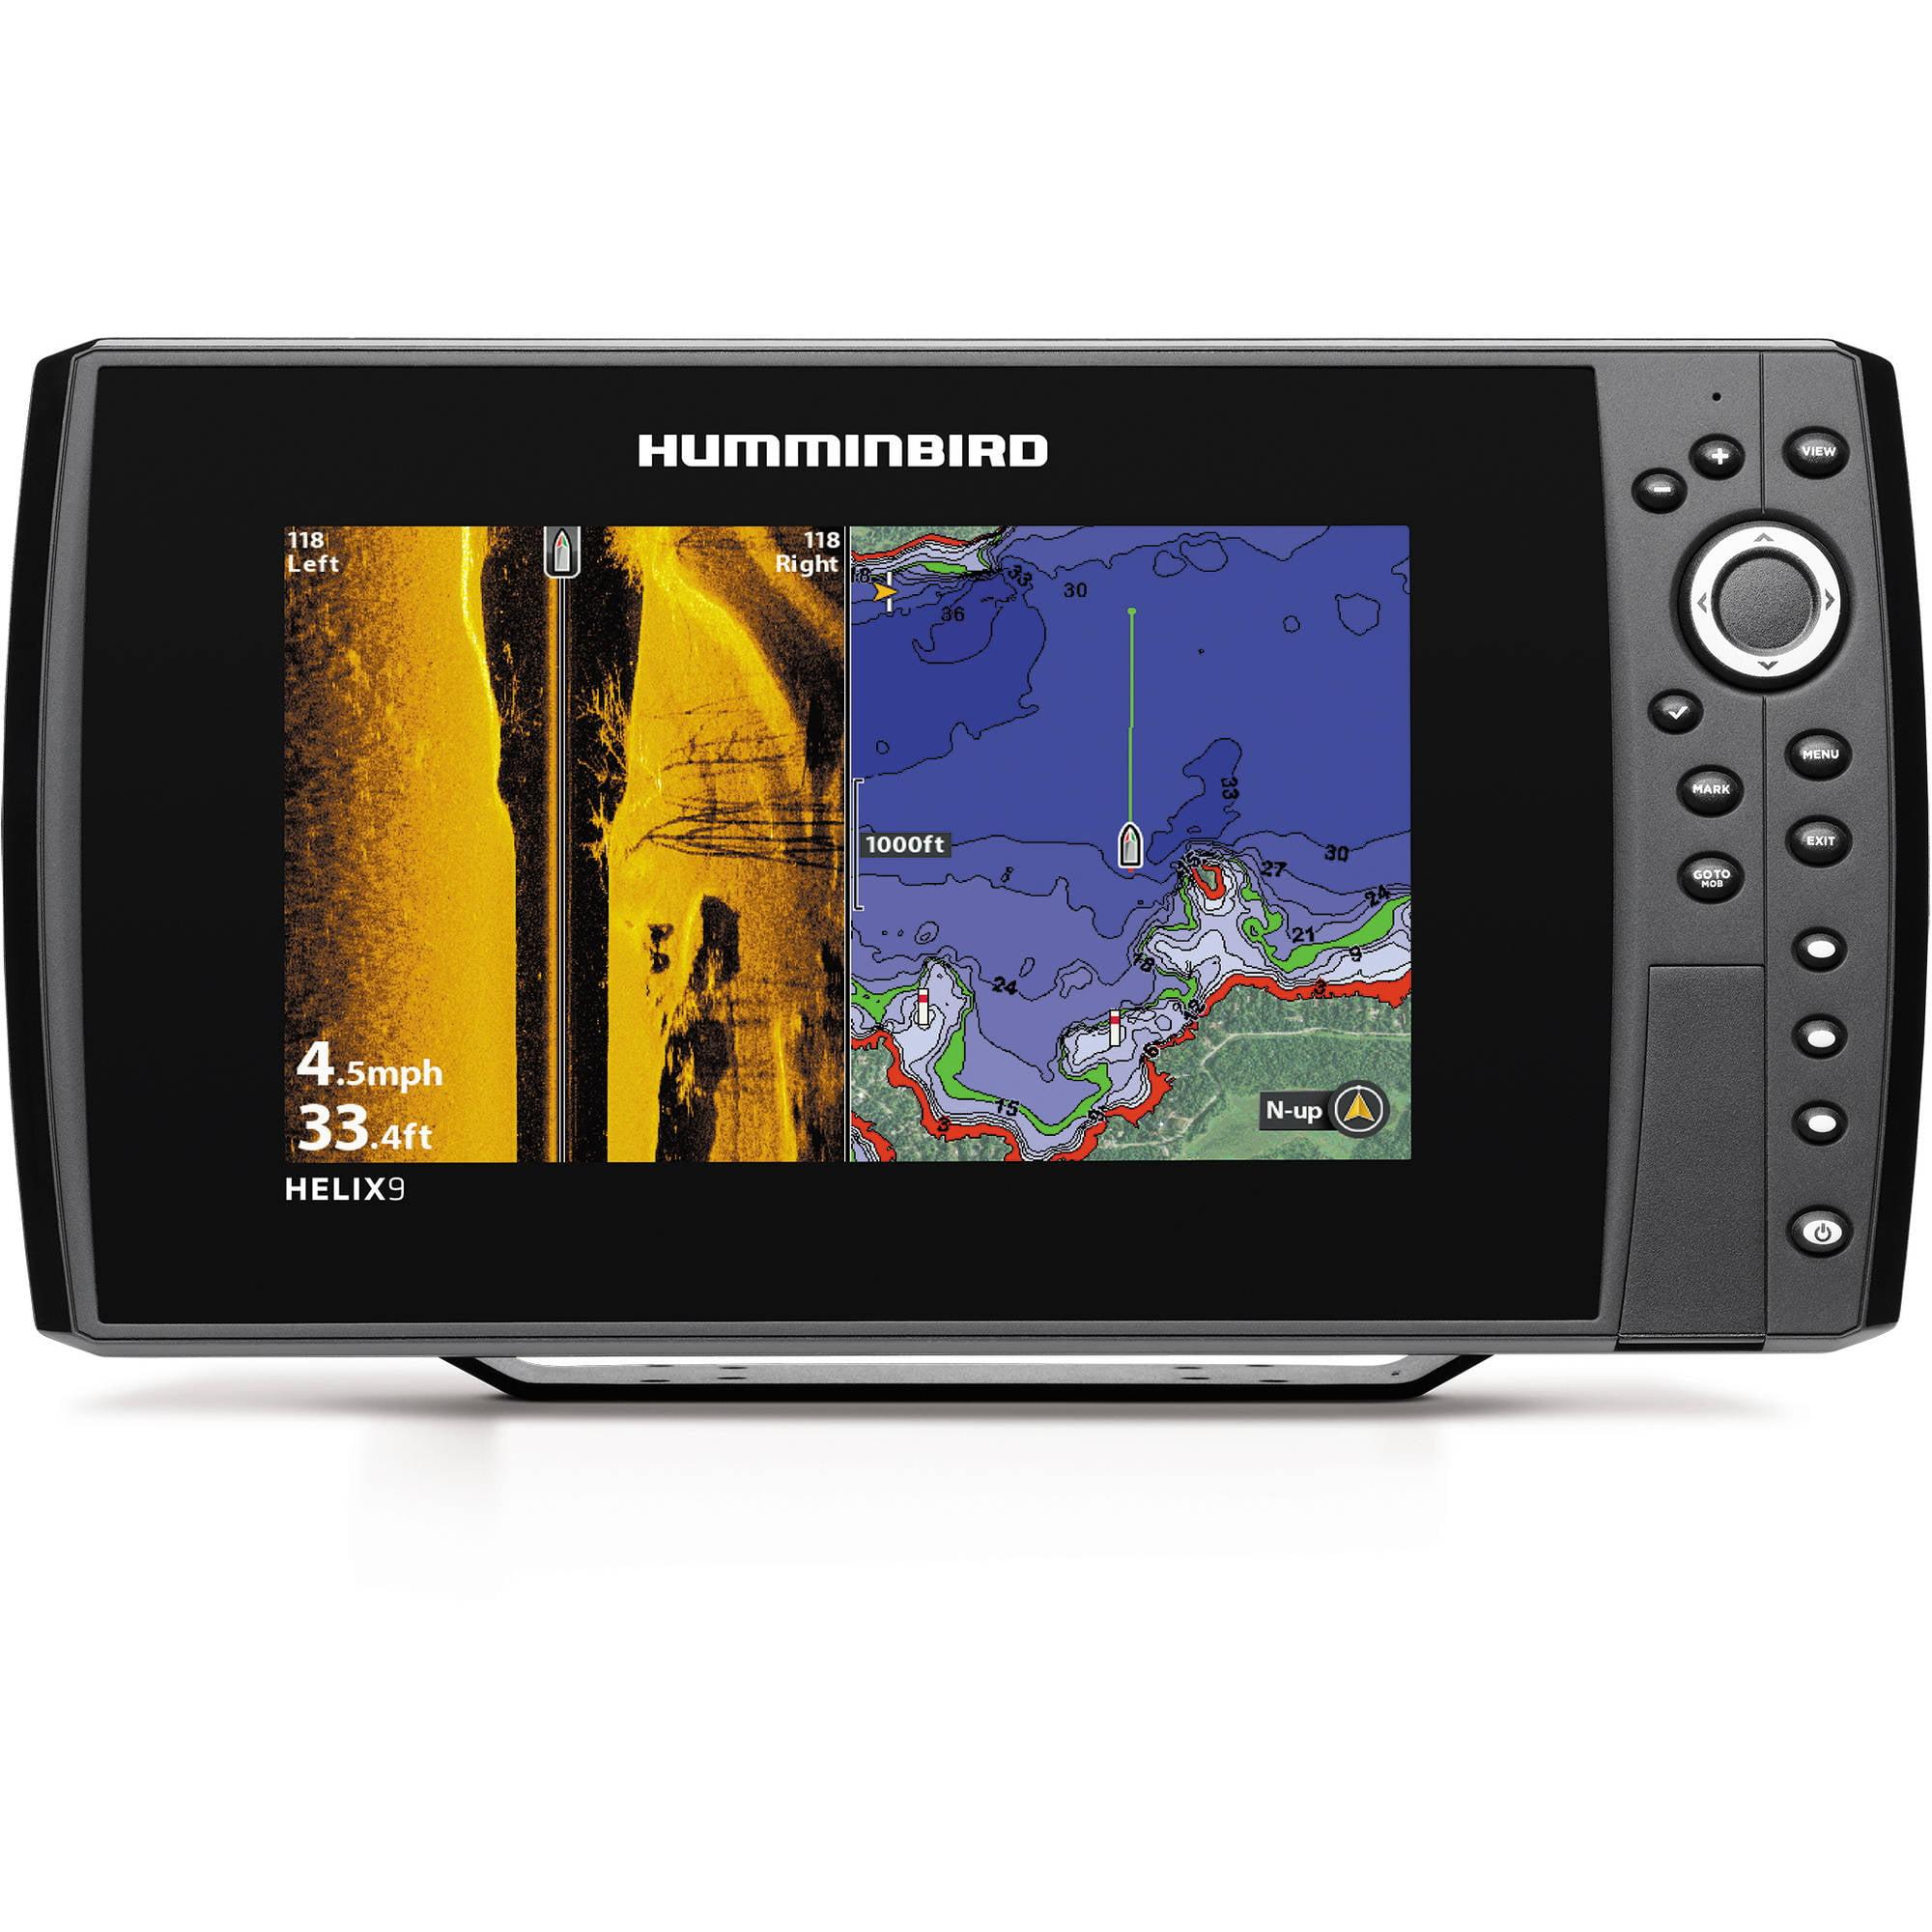 Humminbird HELIX 9 SI GPS Fishfinder Combo with Side Imaging